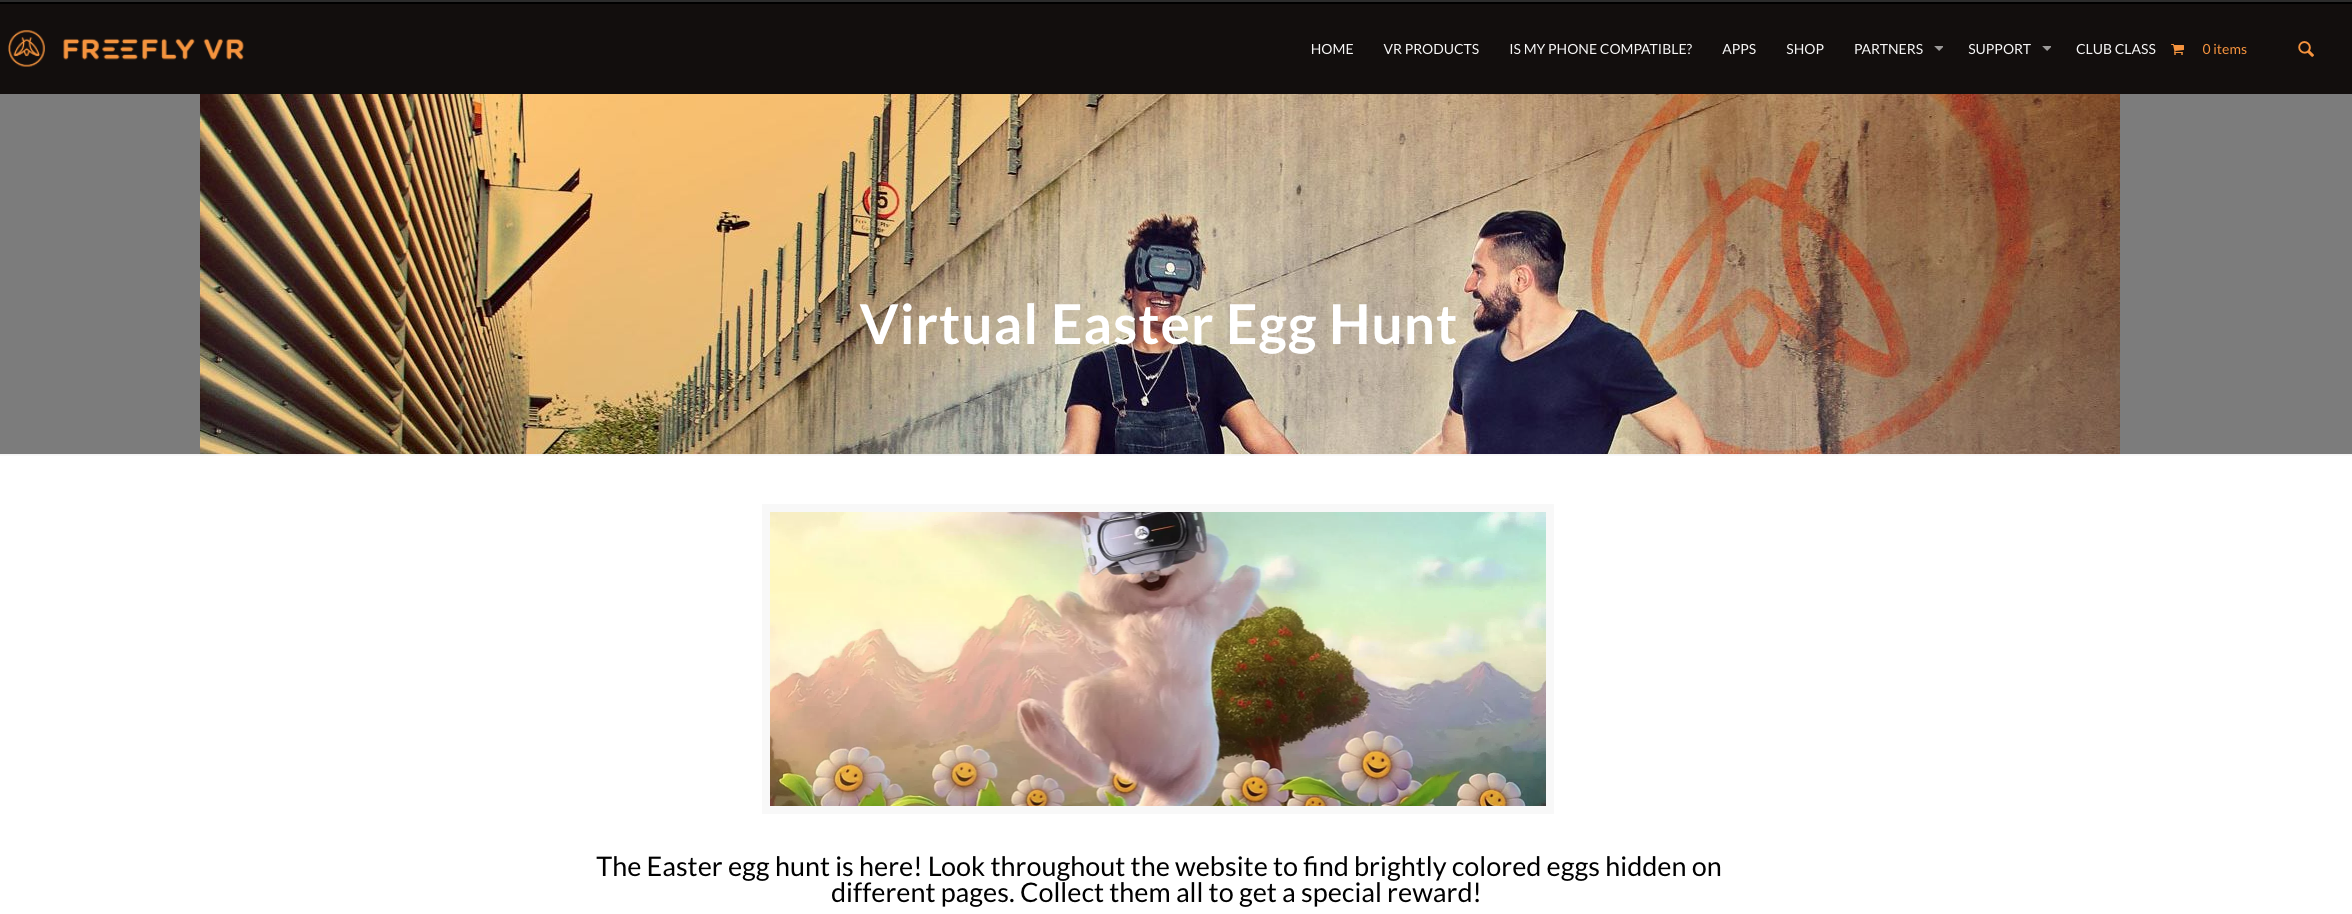 FreeflyVR Easter egg hunt on website